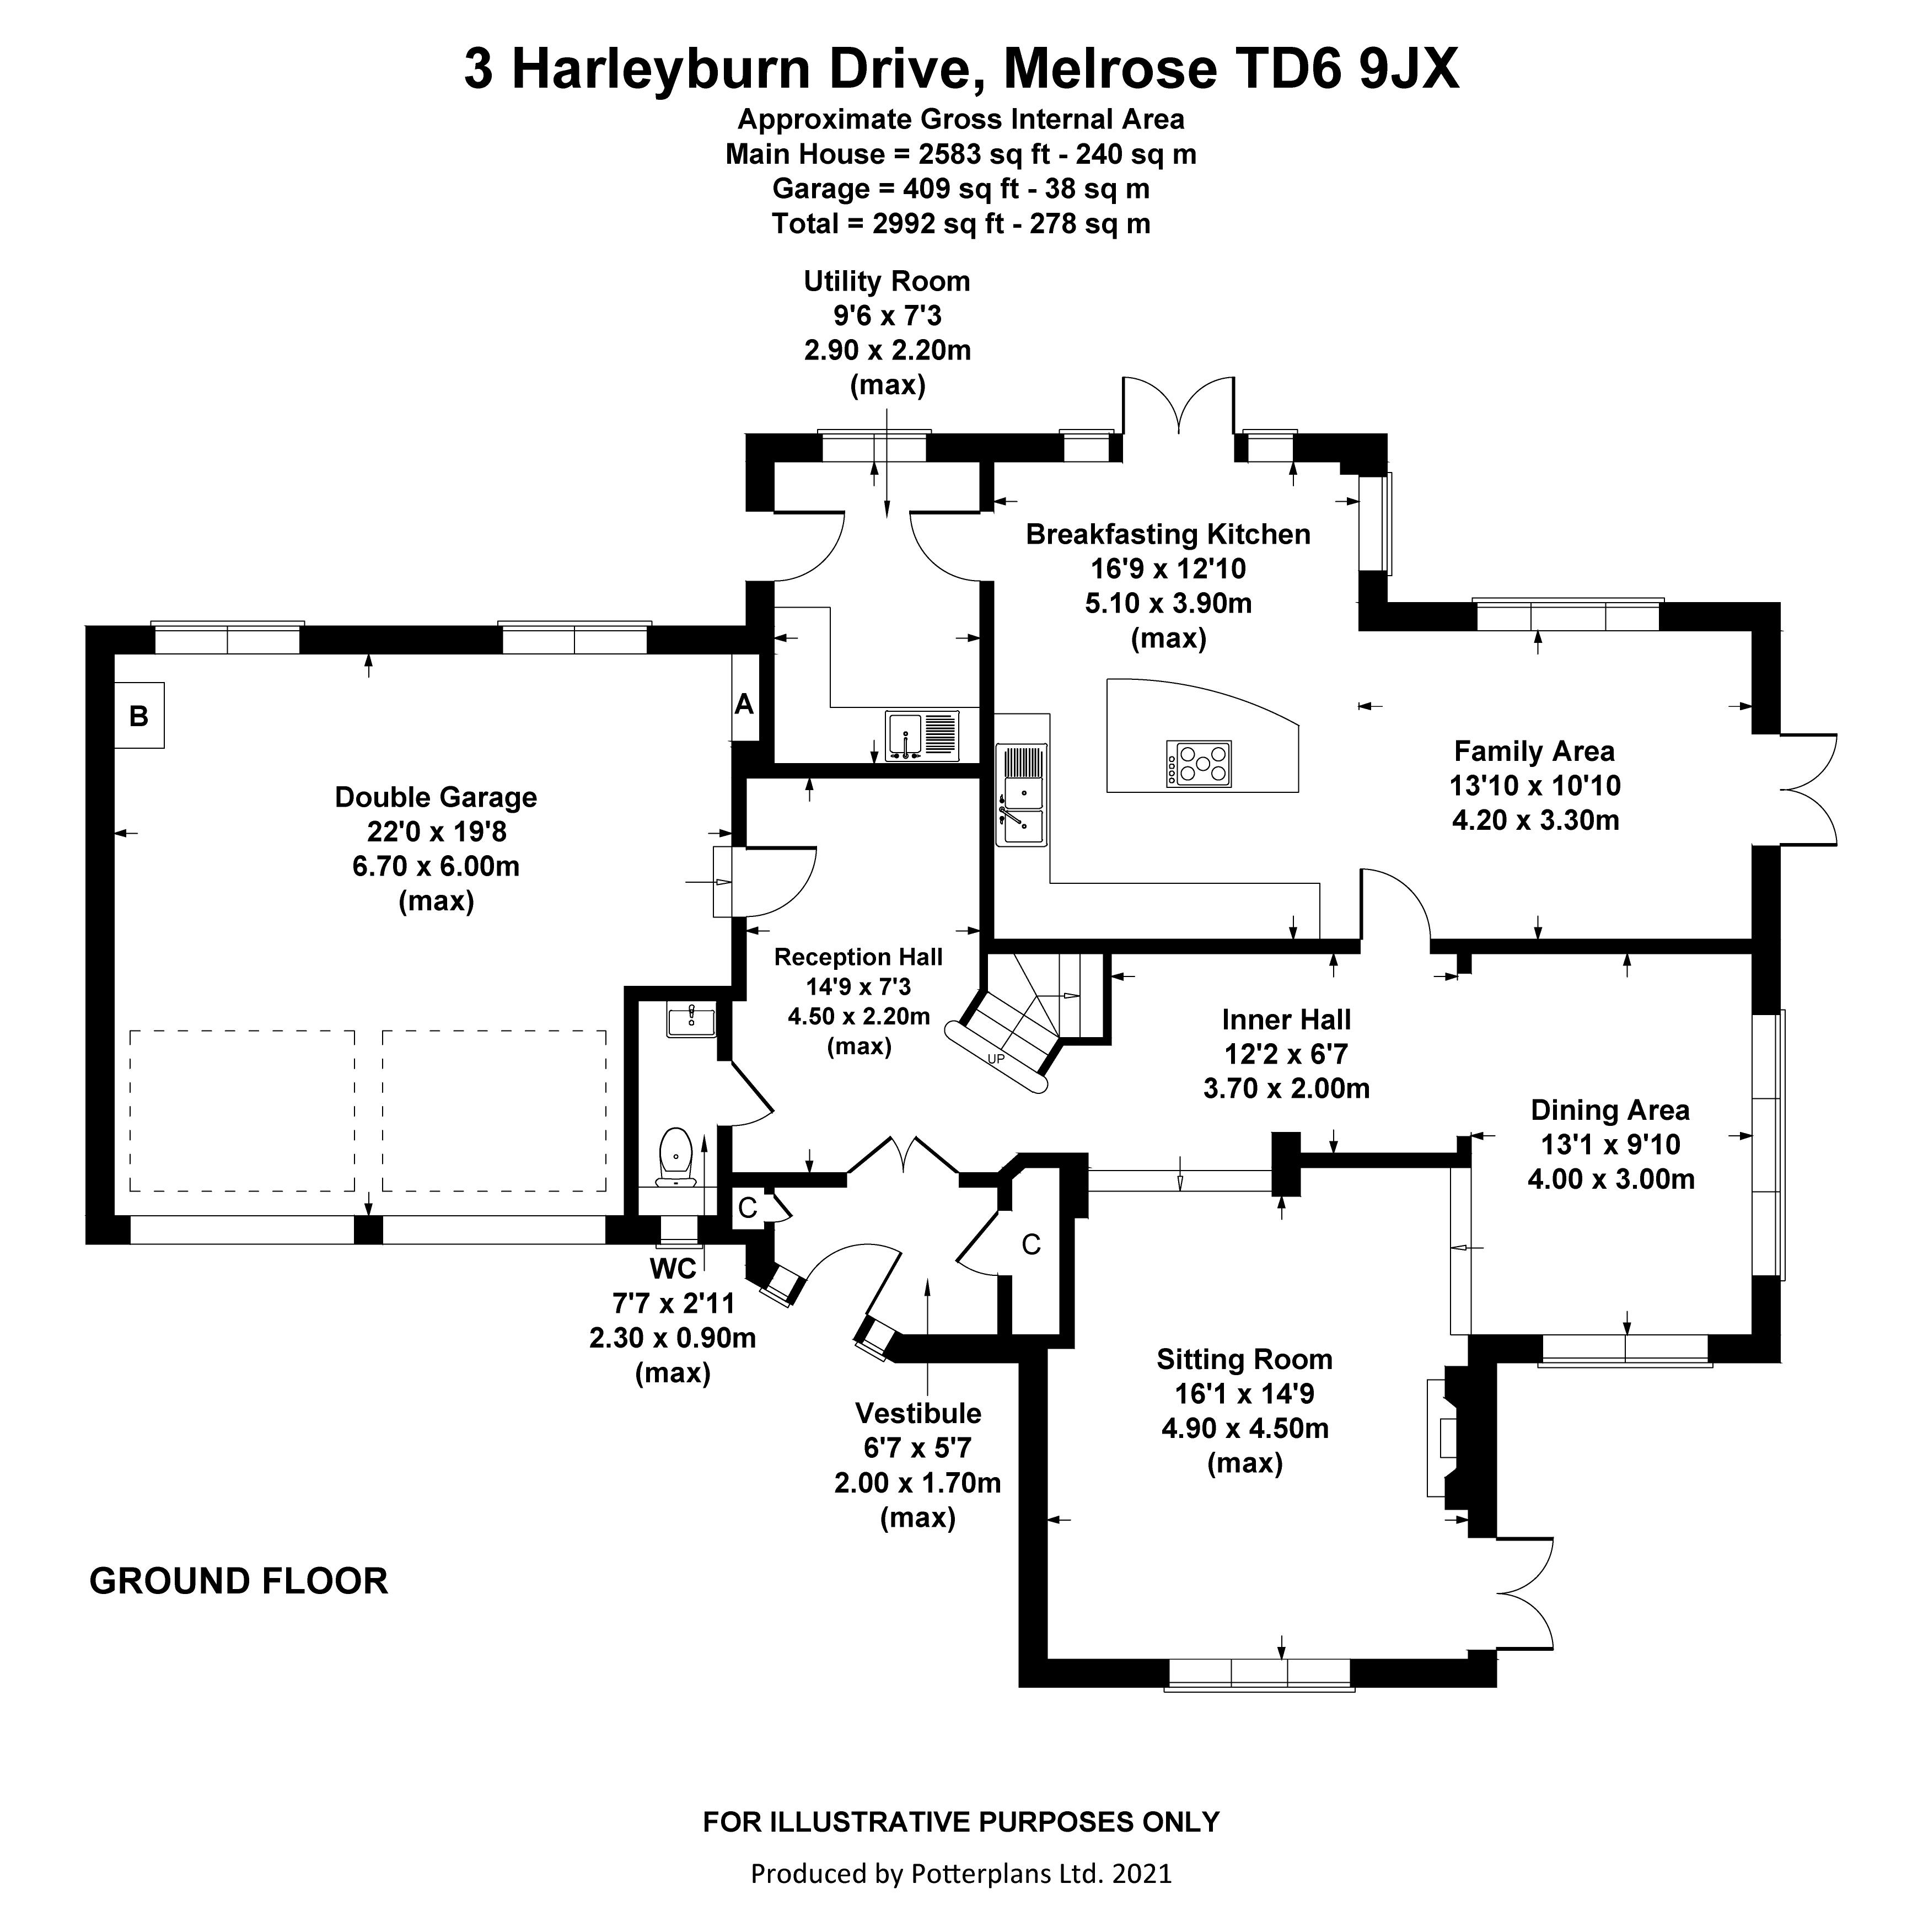 3 Harleyburn Drive Ground Floor